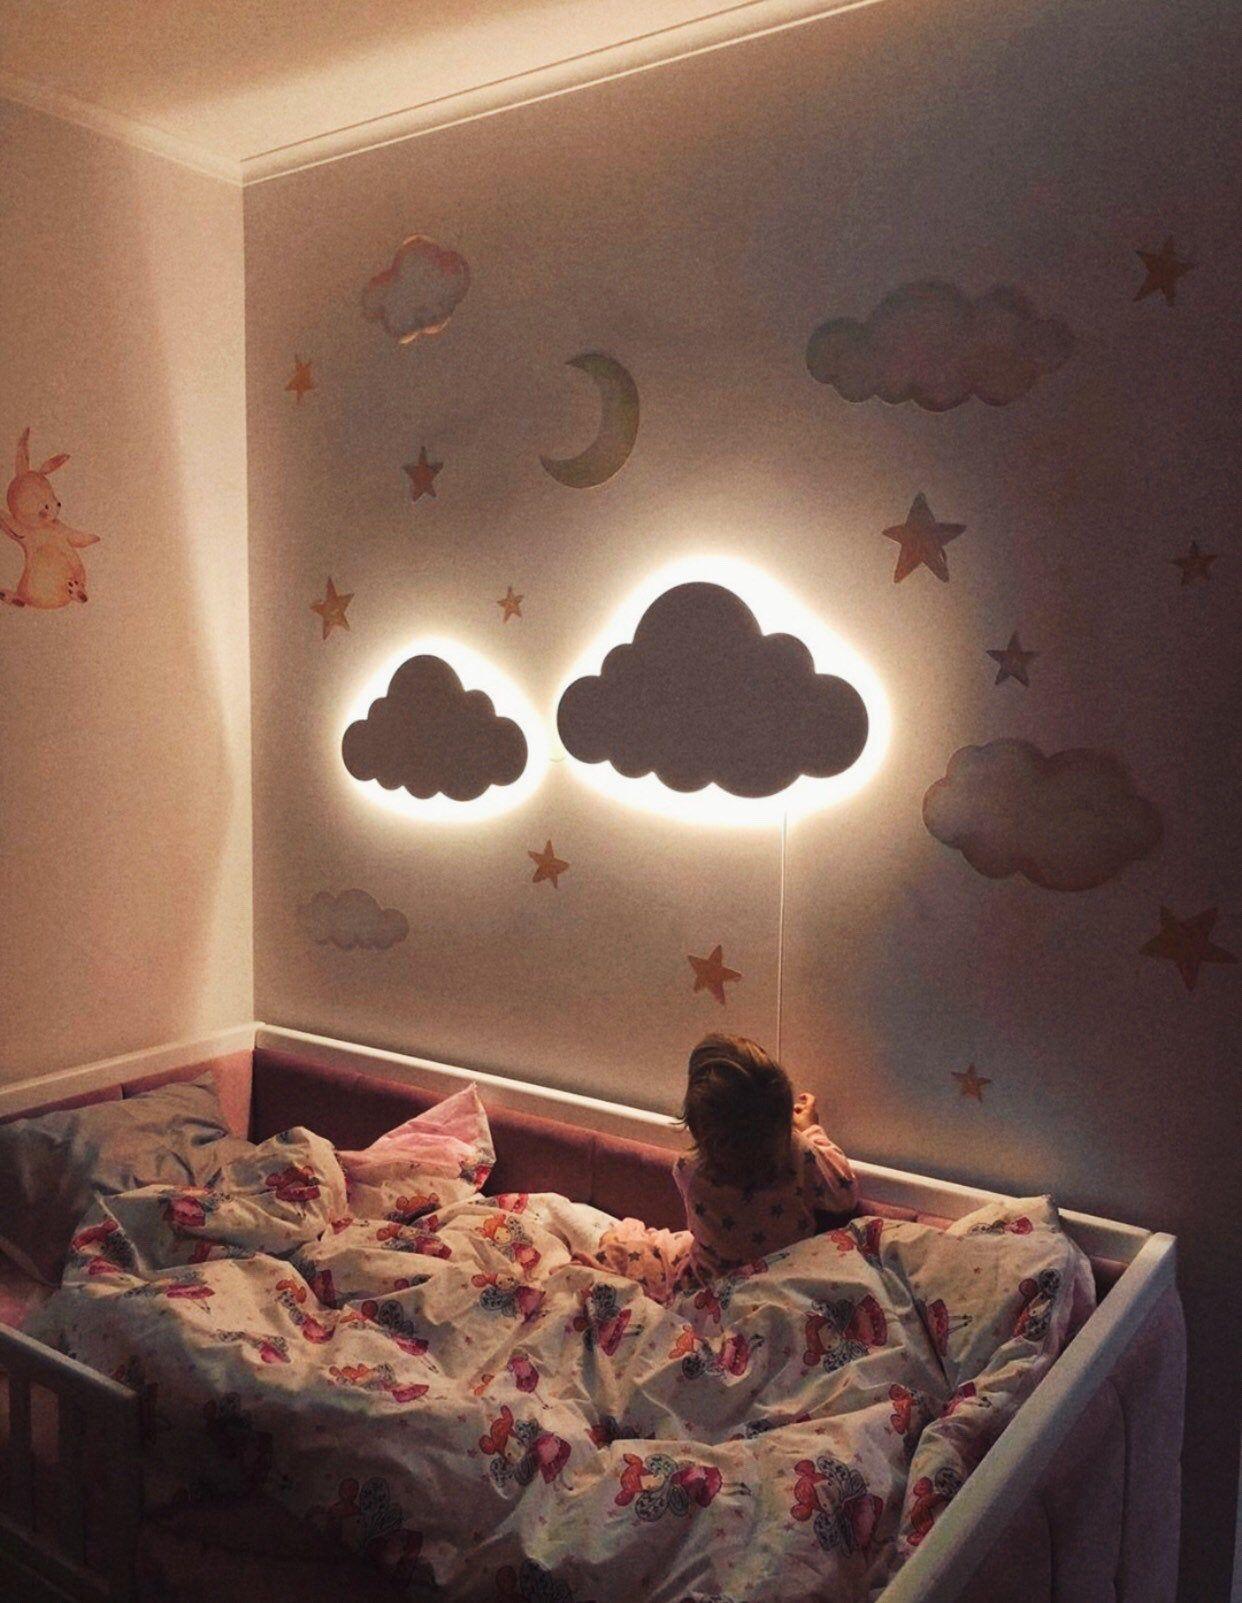 Cloud Night Light Wood Kids Lamp Baby Room Led Lamp Nursery | Etsy | Baby Wall Decor, Cloud Night Light, Baby Room Decor